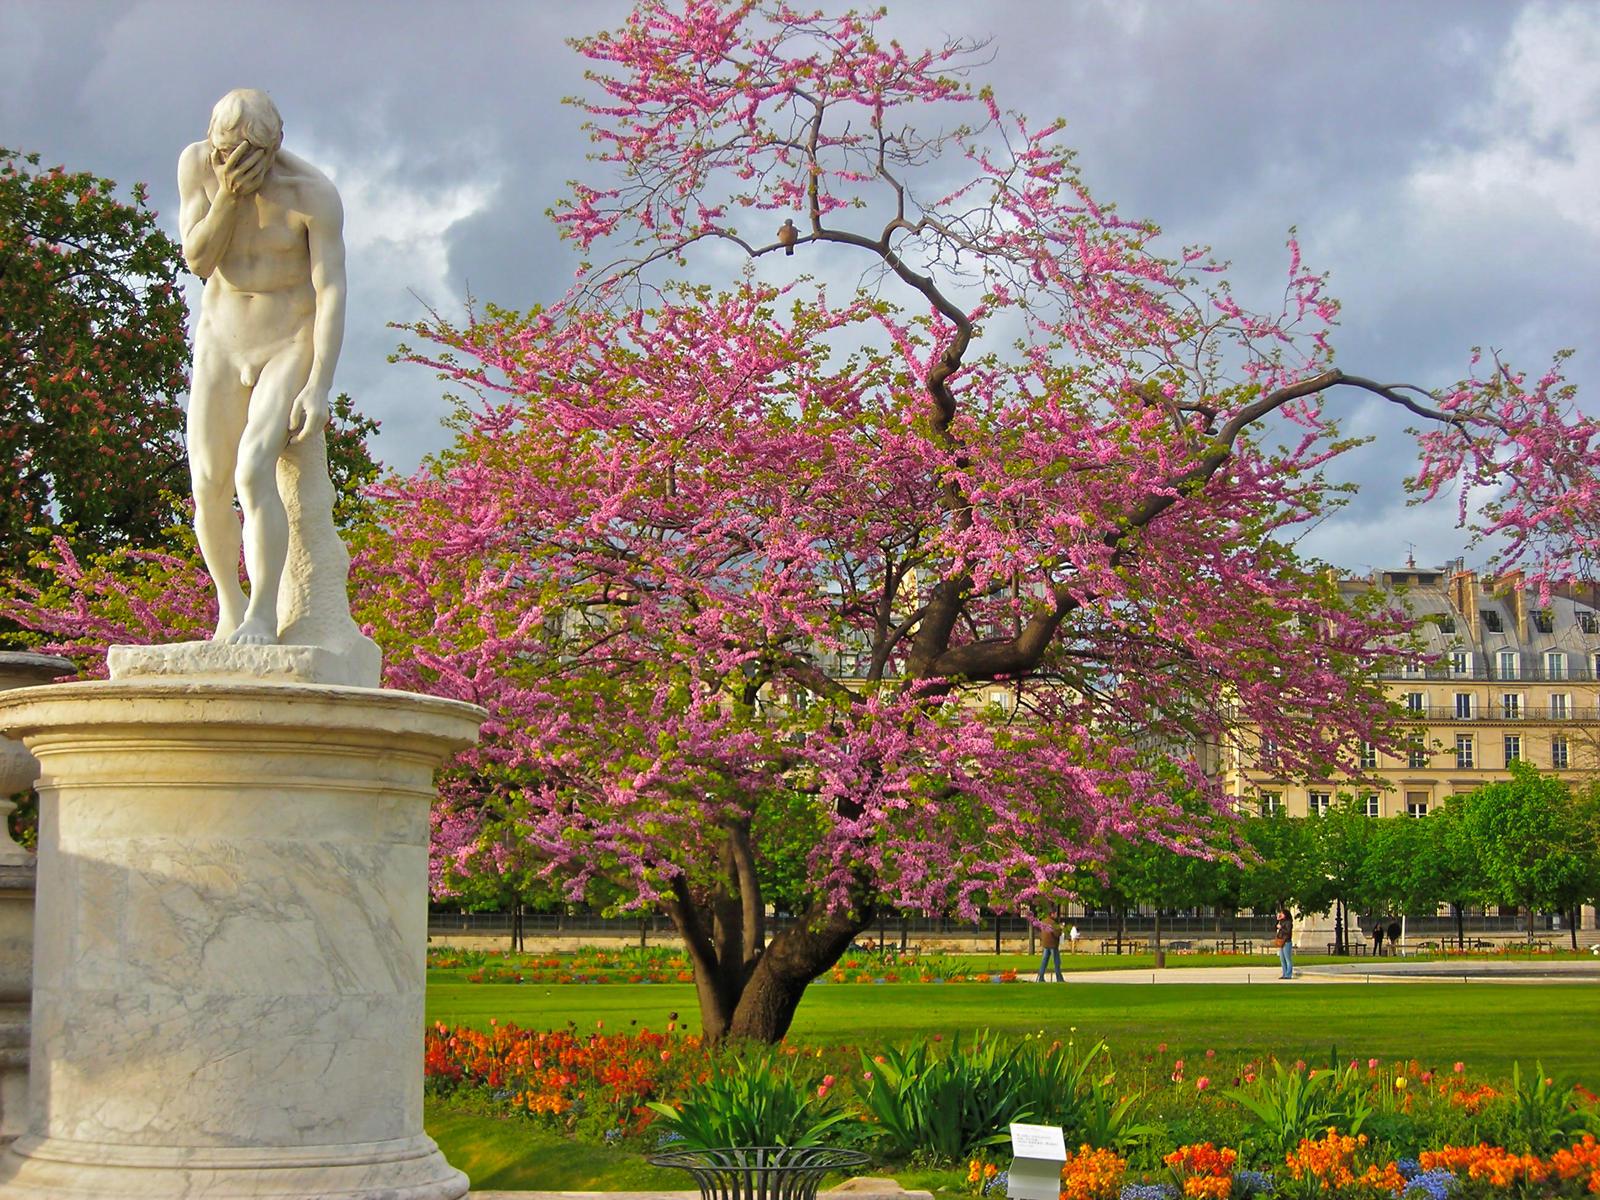 Paris jardin des tuileries by casiisla on deviantart for Jardins jardins des tuileries